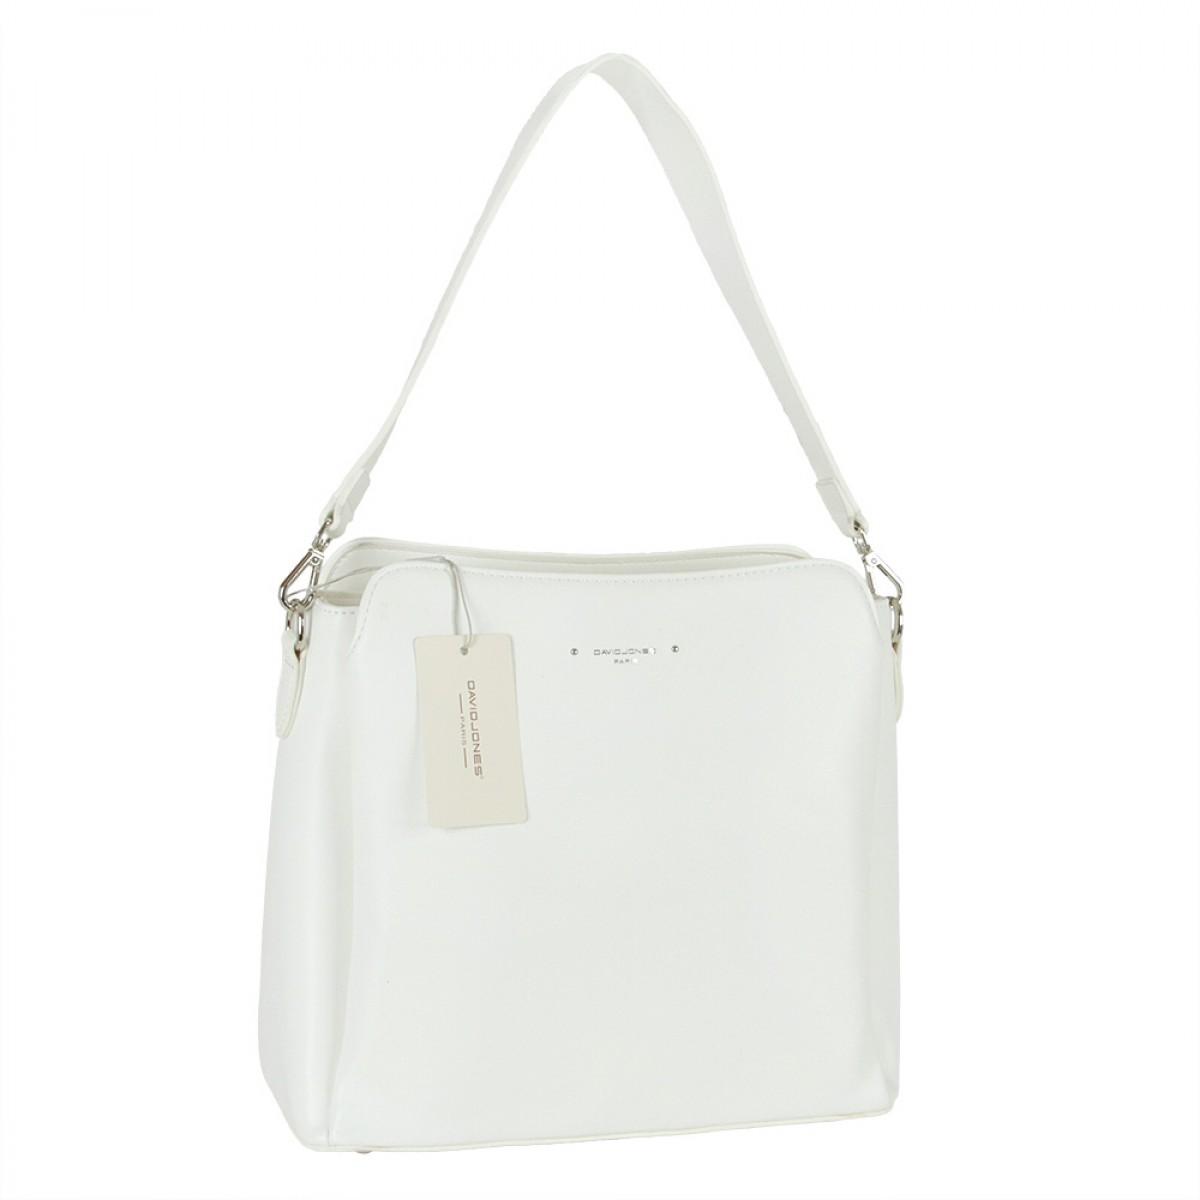 Жіноча сумка David Jones 6295-1 WHITE